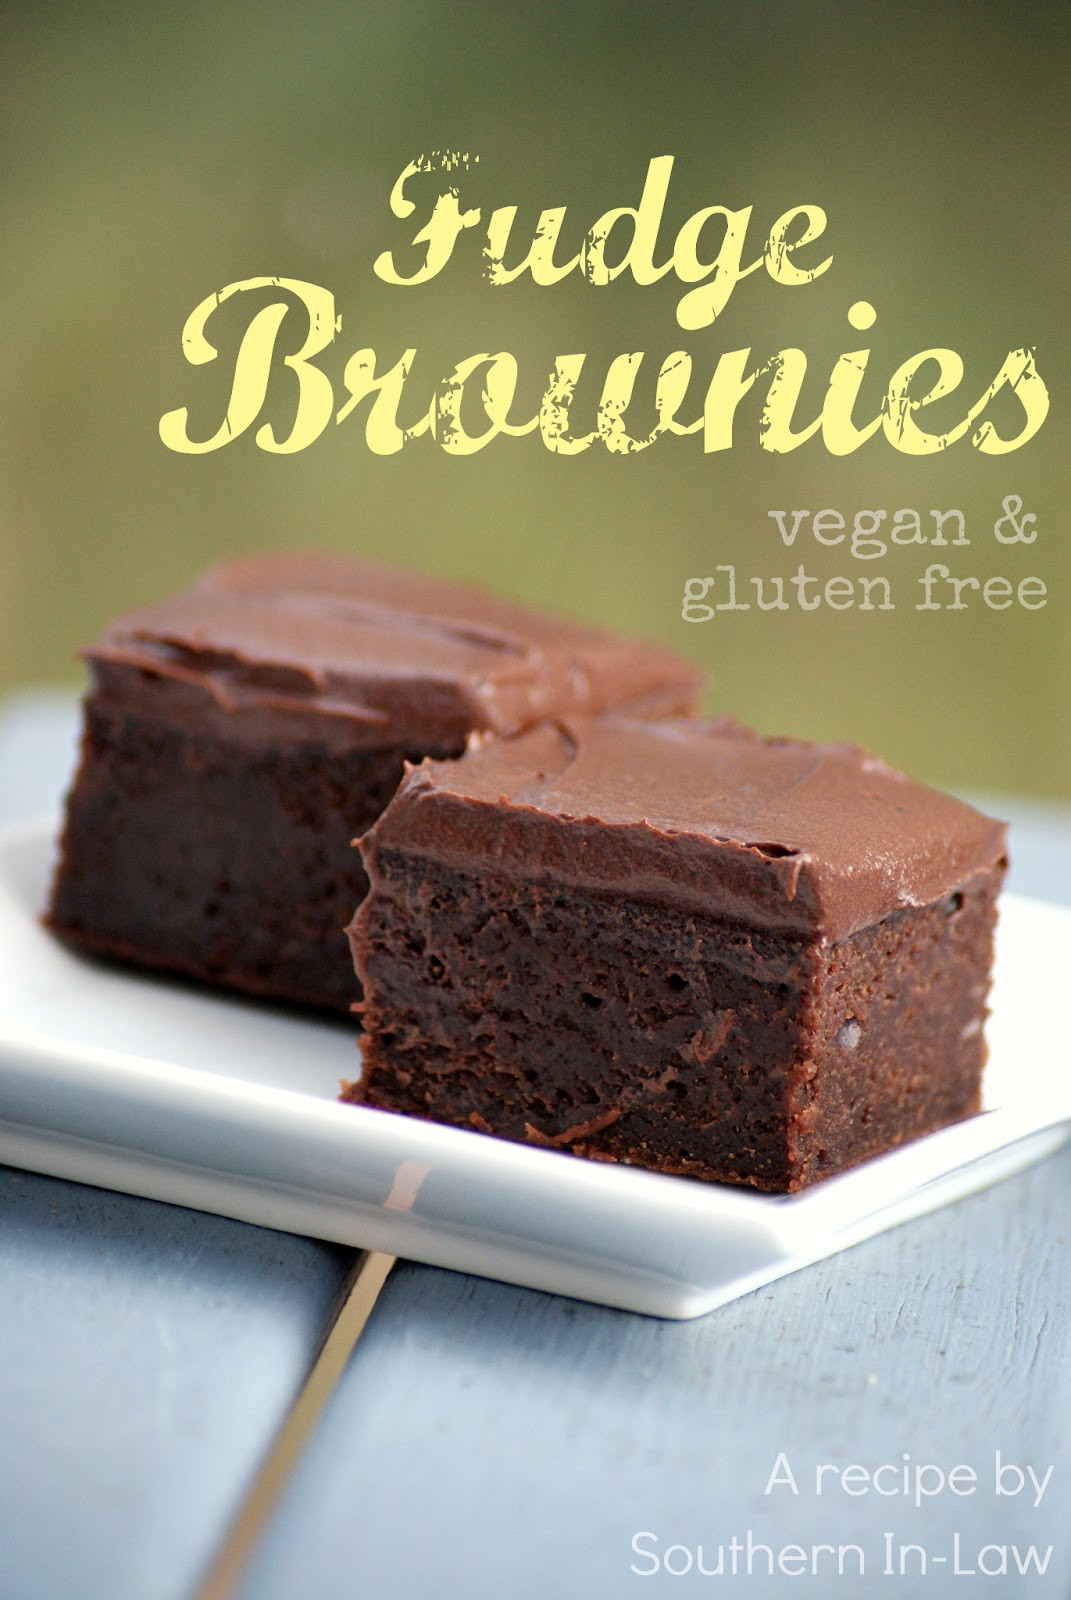 Vegan Fudge Brownies  Southern In Law Recipe Vegan Fudge Brownies with Vegan